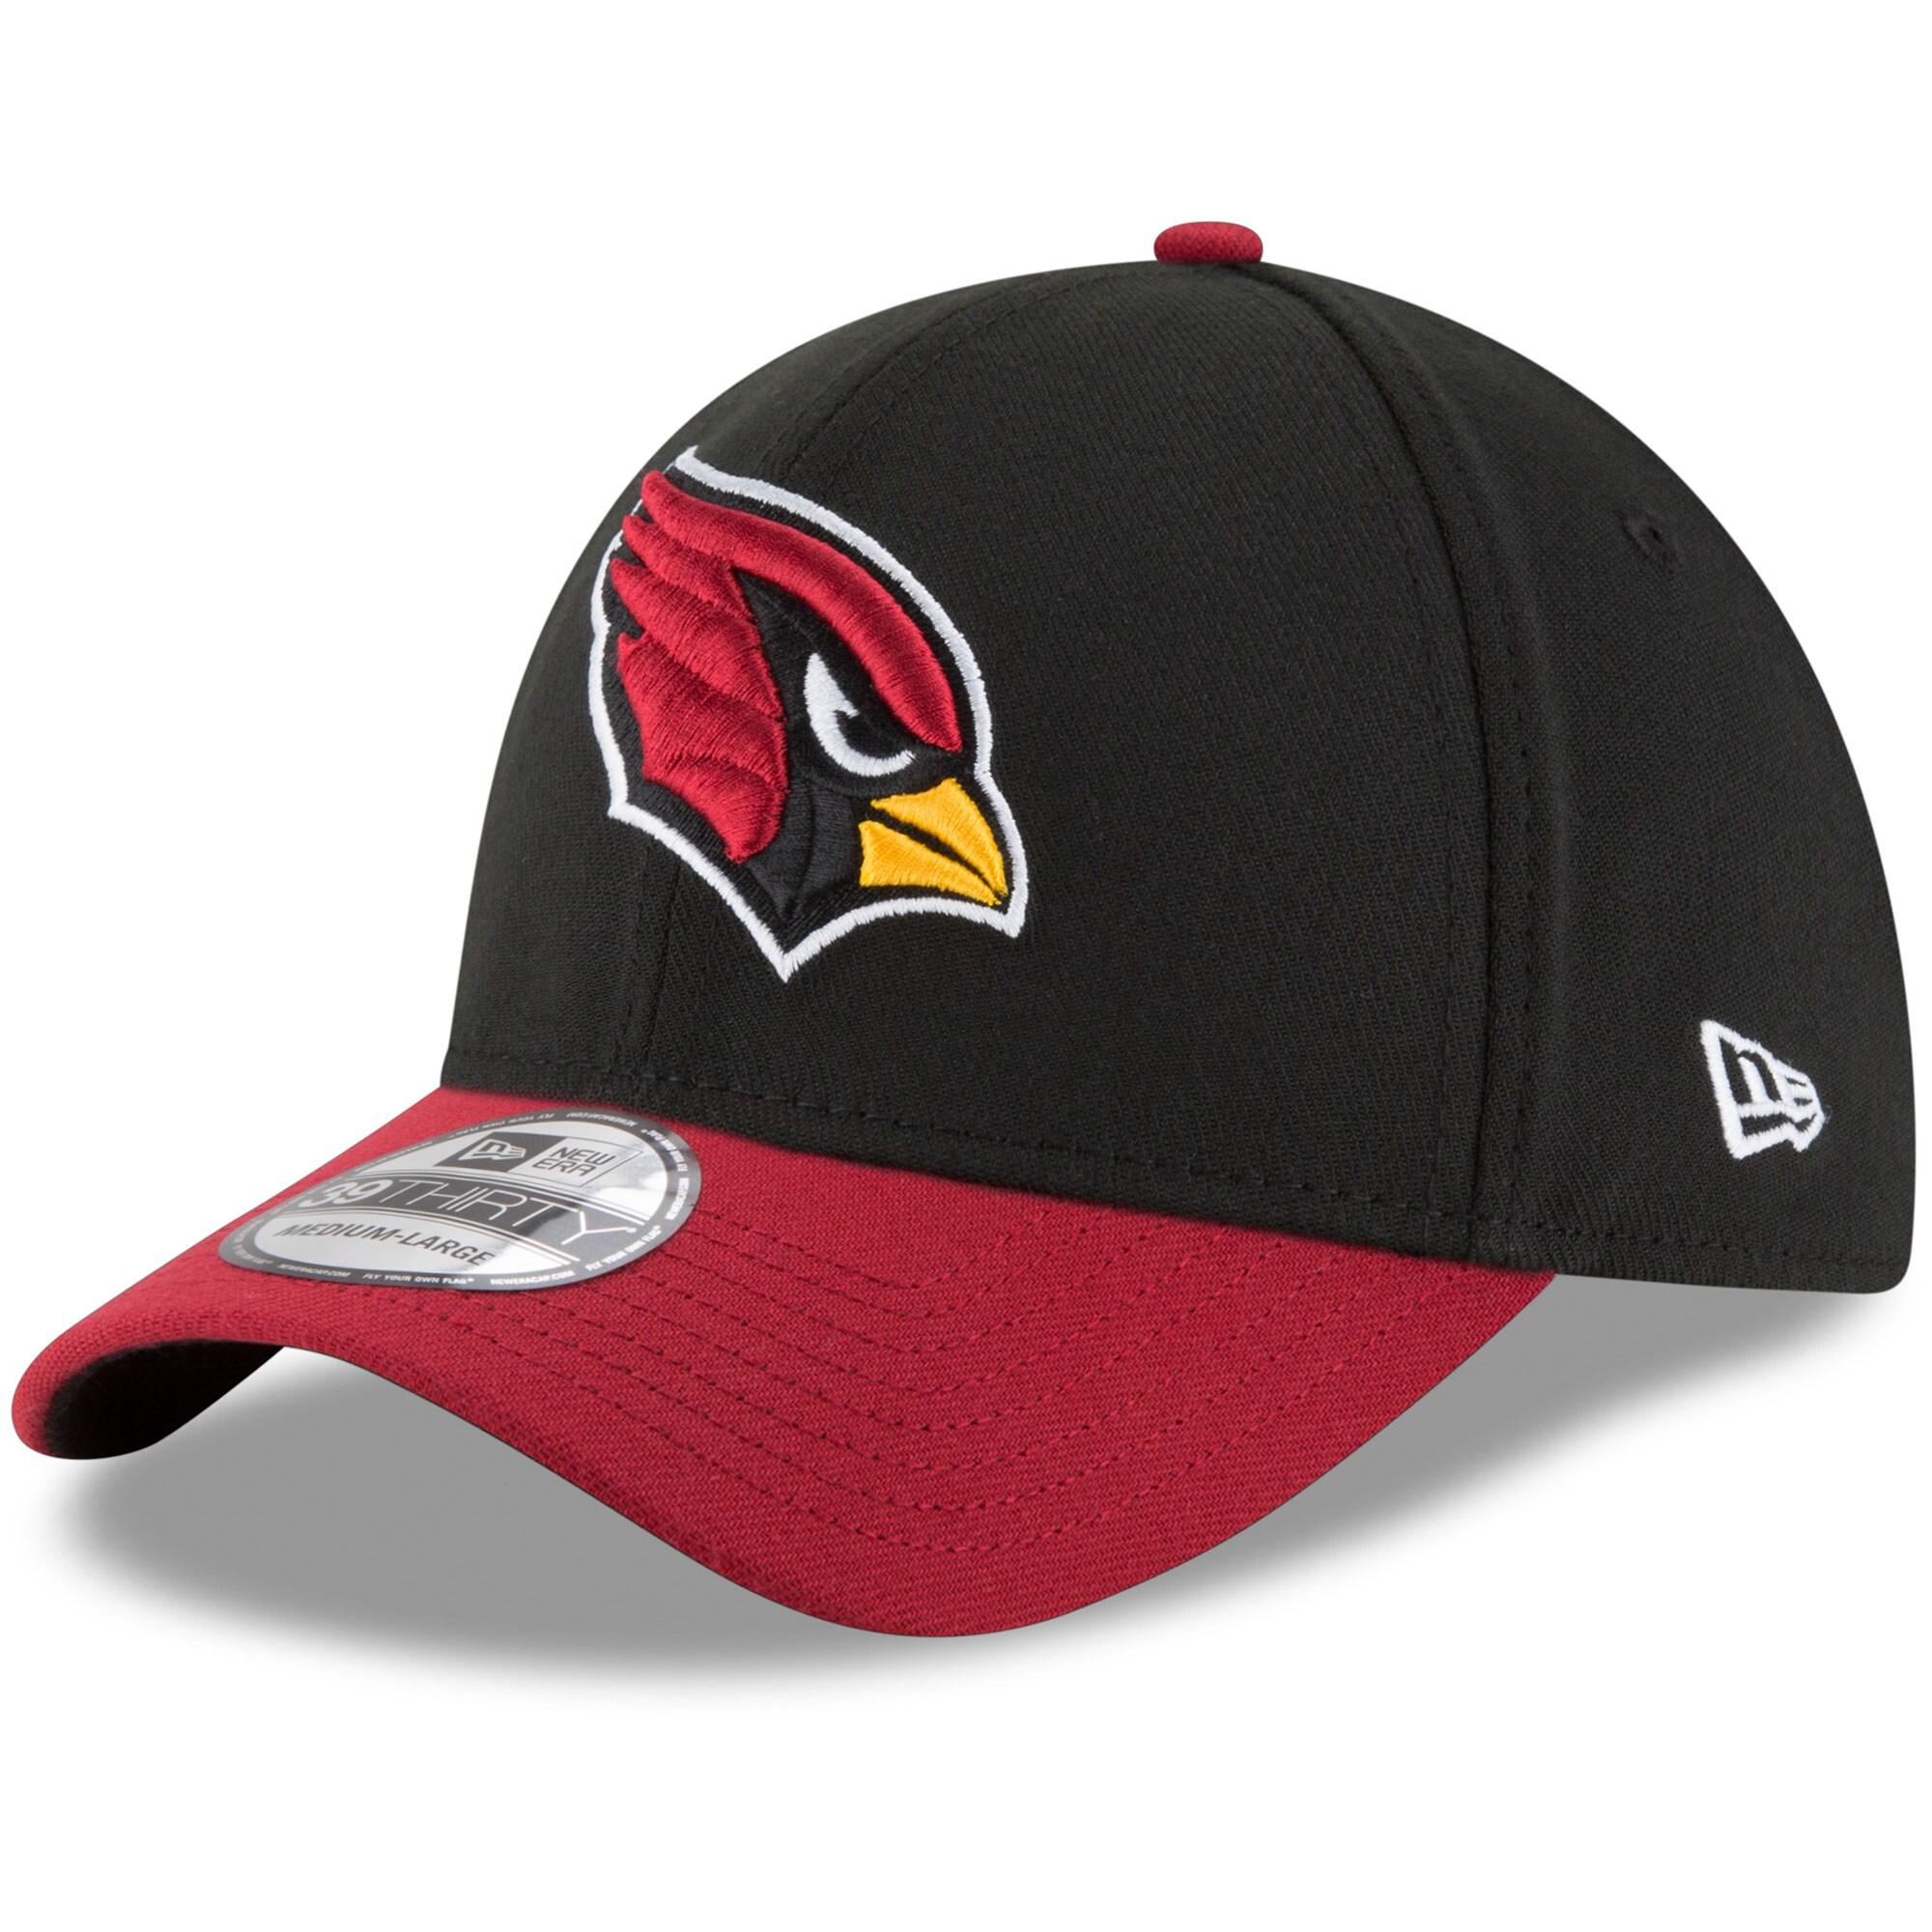 Arizona Cardinals New Era Team Classic Two-Tone 39THIRTY Flex Hat - Black/Cardinal